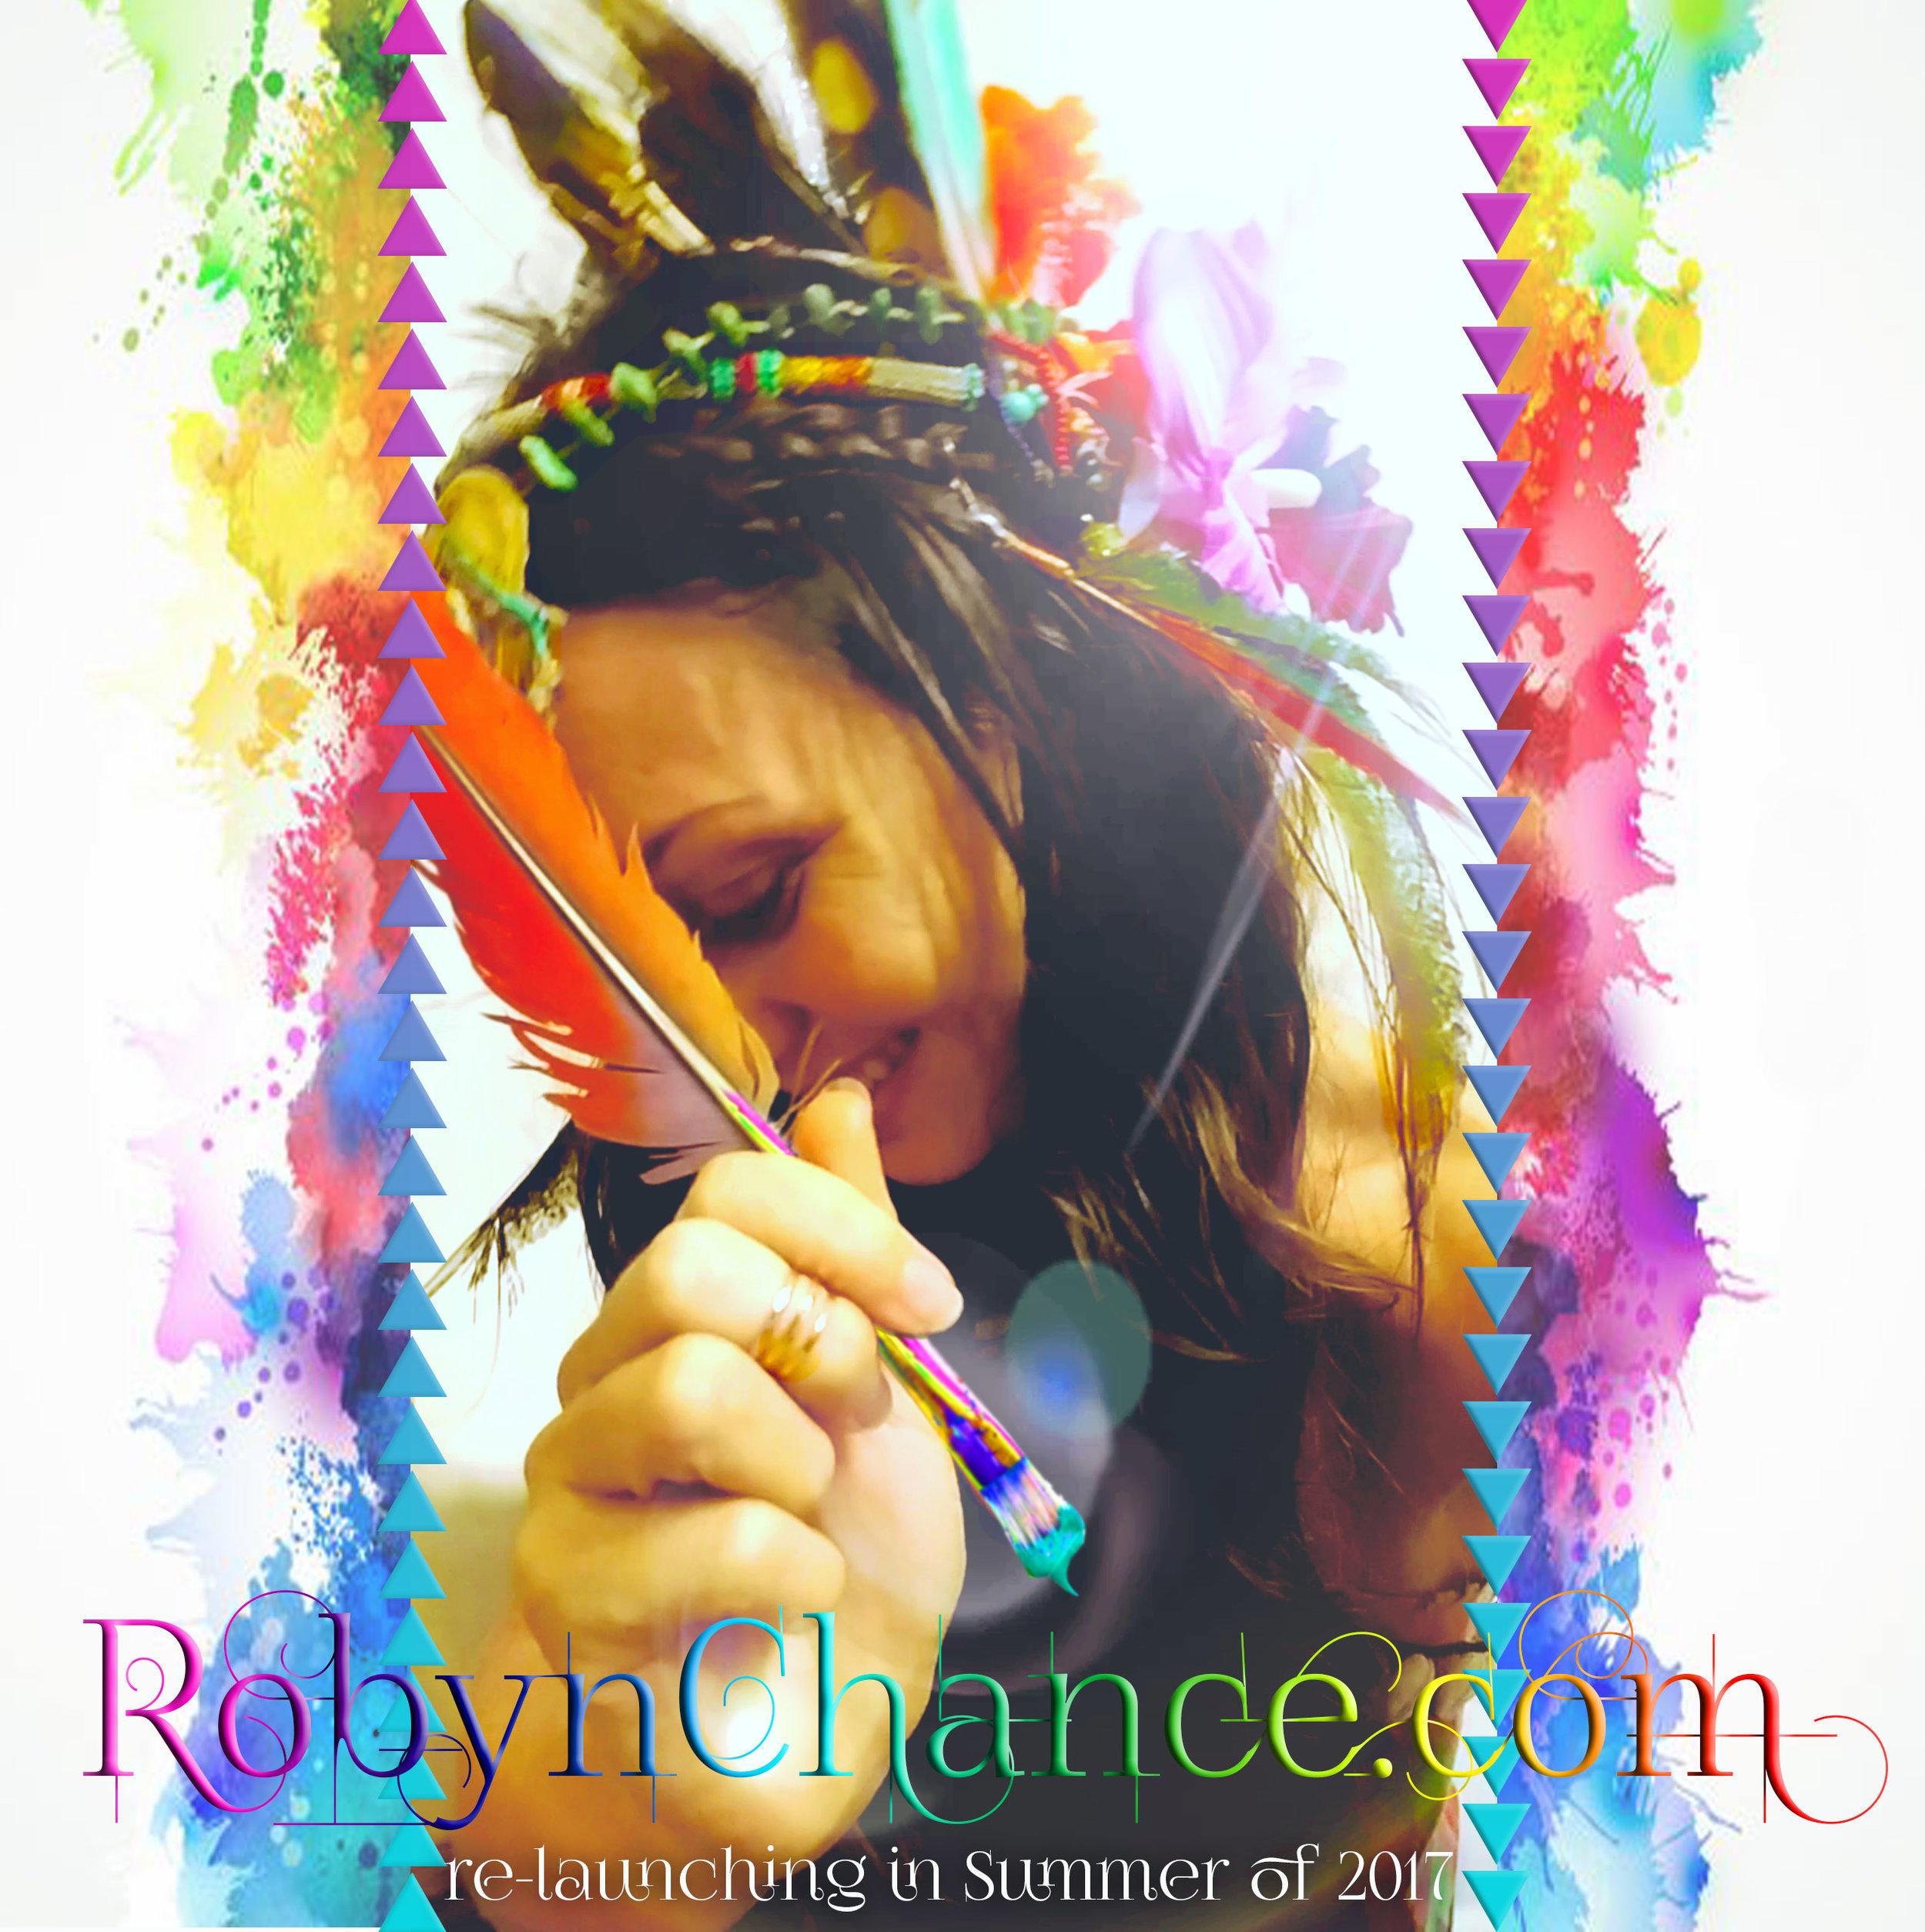 RobynChanceReLaunchPromoweb2.jpg